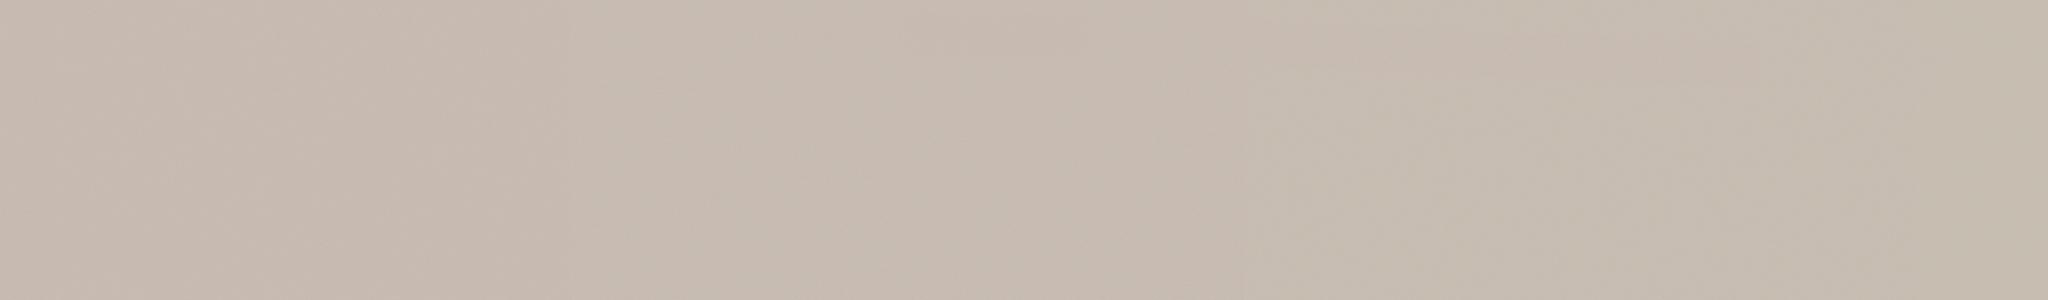 HU 170727 ABS Kante Stein Grau glatt Supermatt